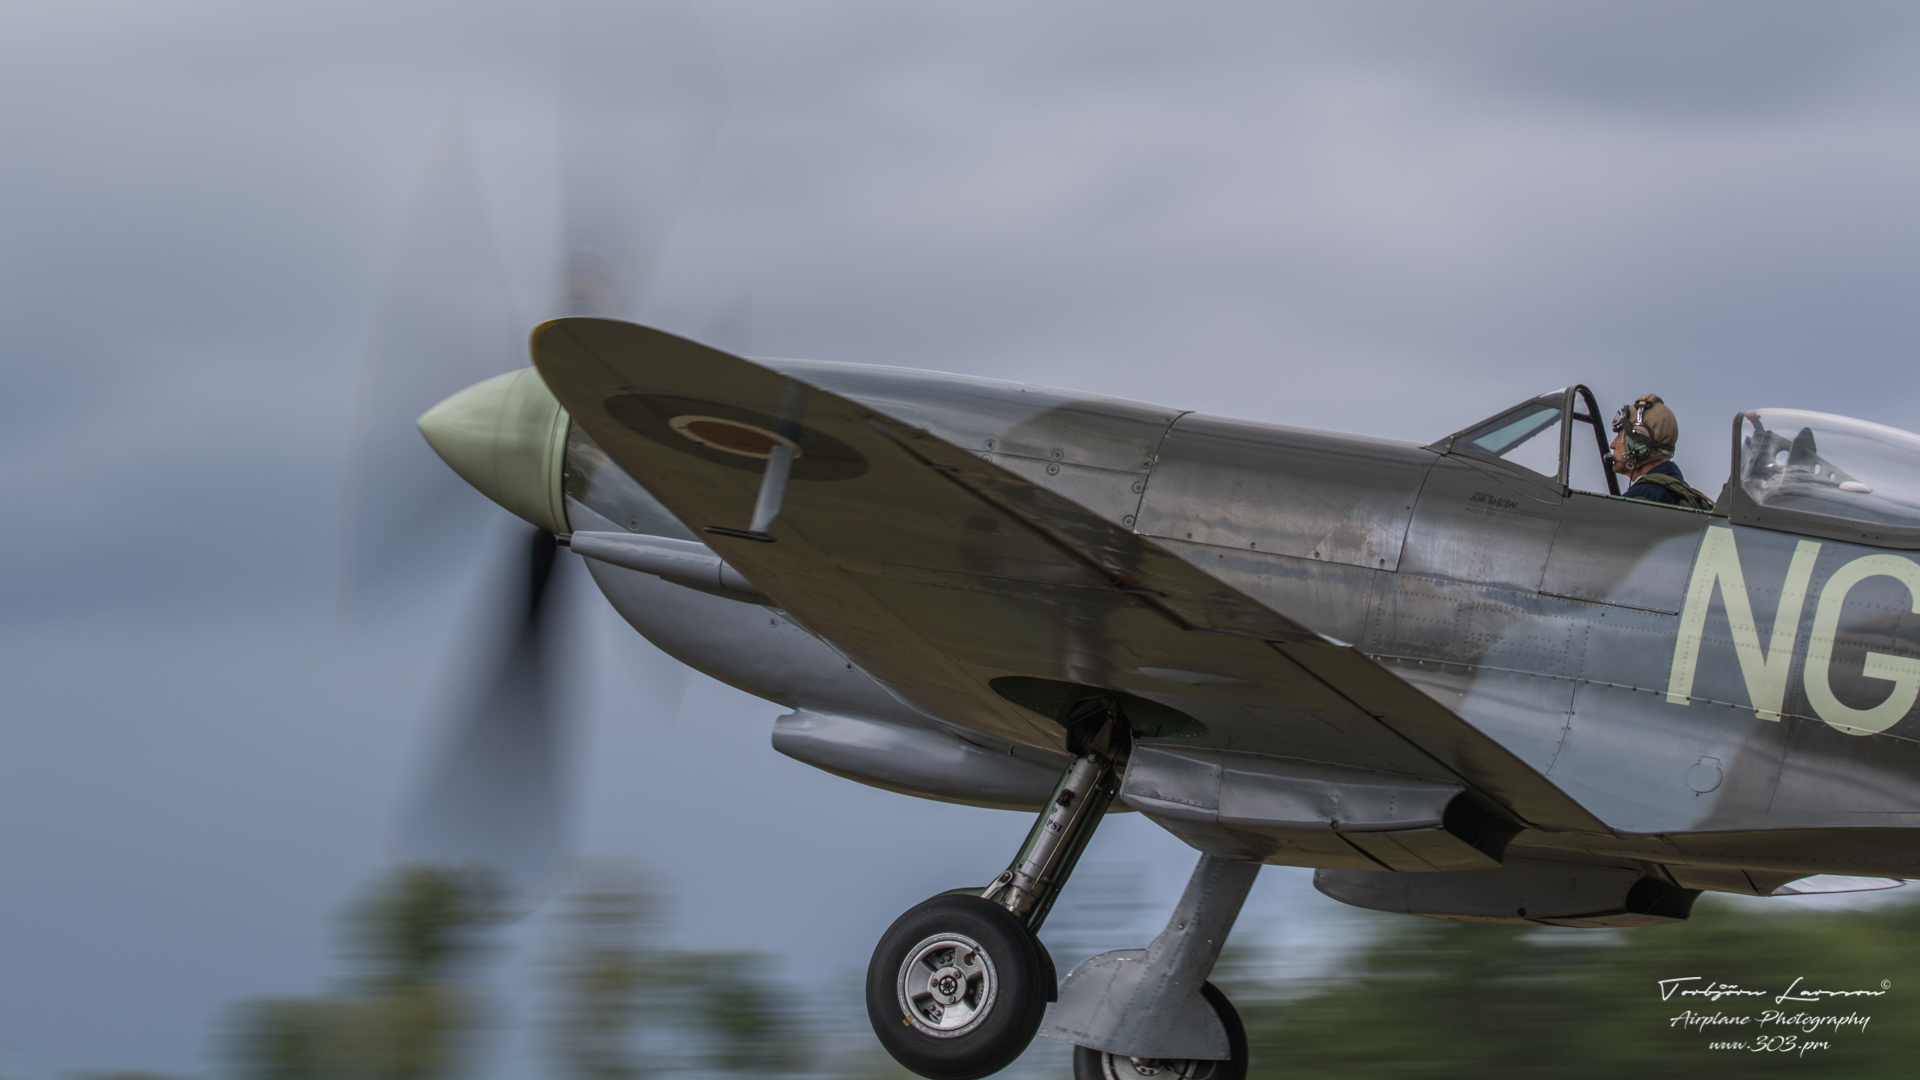 TBE_0759-Supermarine Spitfire-LF.XVI (SE-BIR)